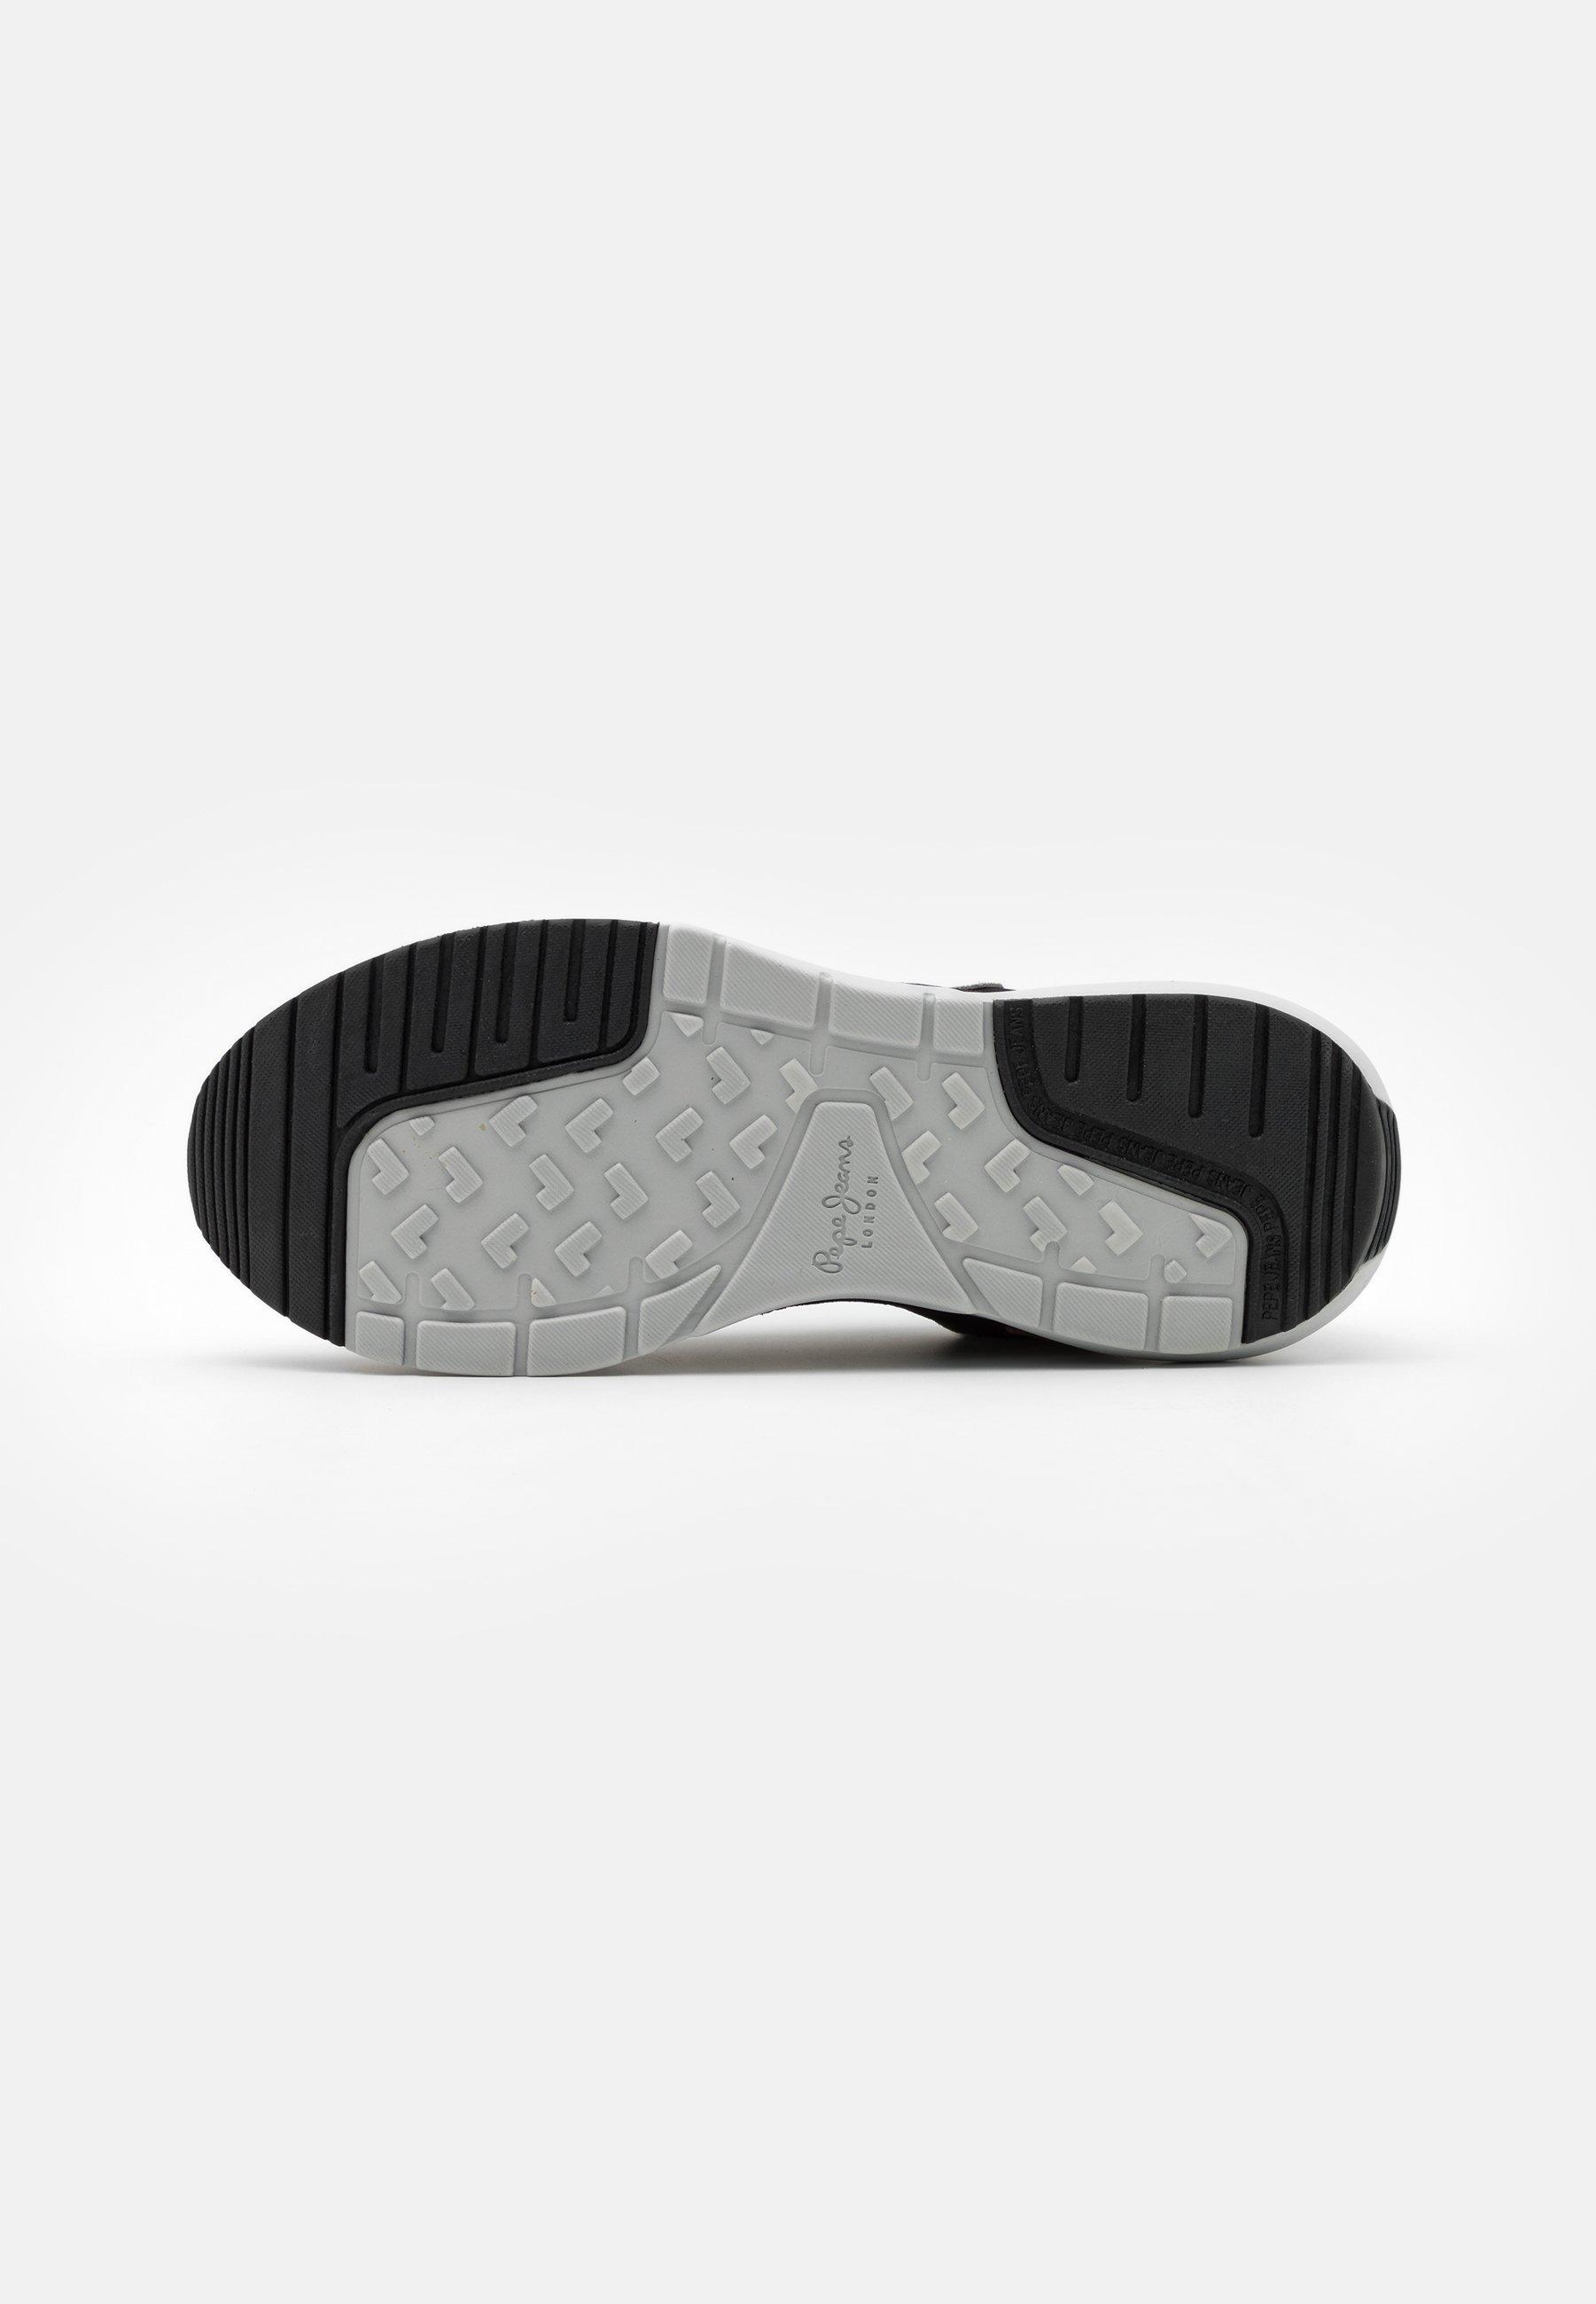 Pepe Jeans PARK AIR SPORT - Sneaker low - black/schwarz - Herrenschuhe zPnSV